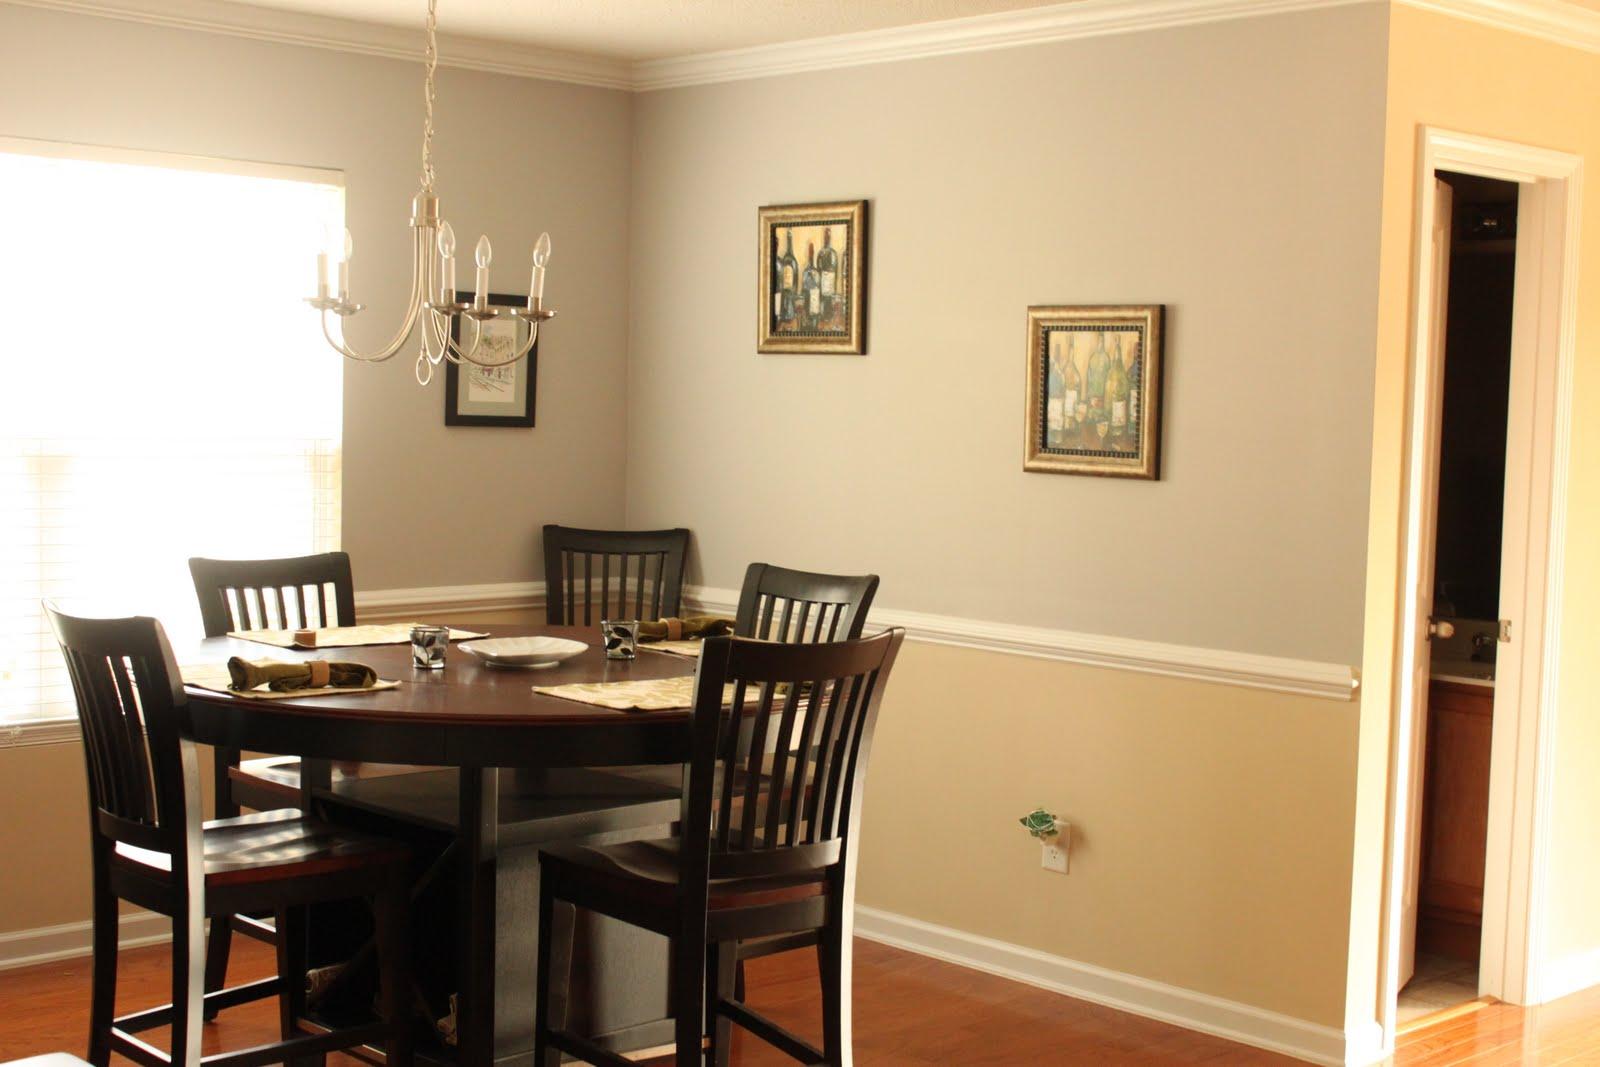 diningroom colors photo - 2